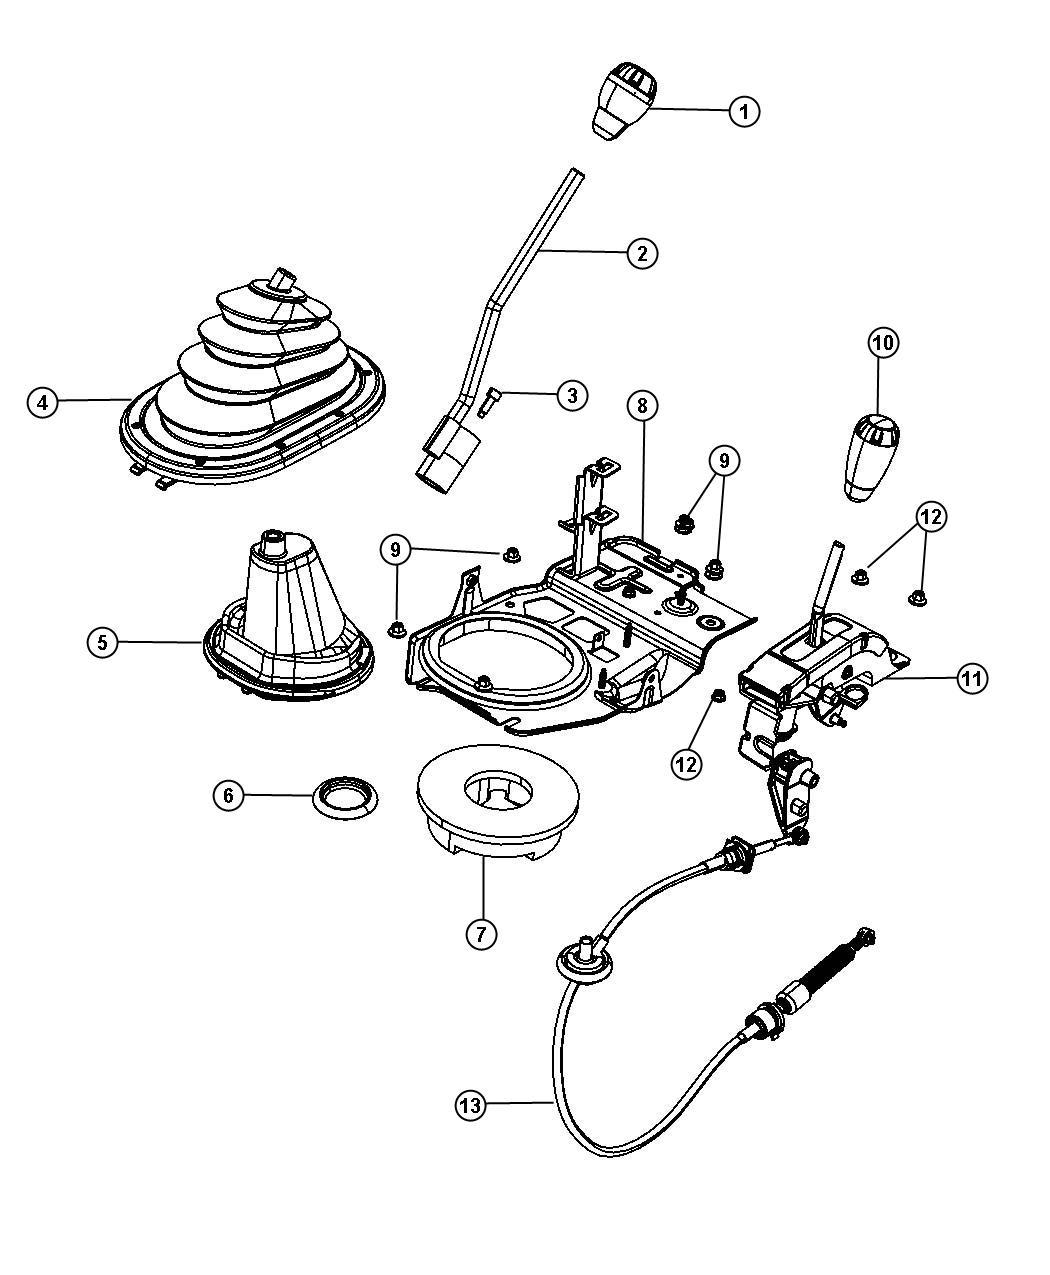 Thermo king mp 3000 manual